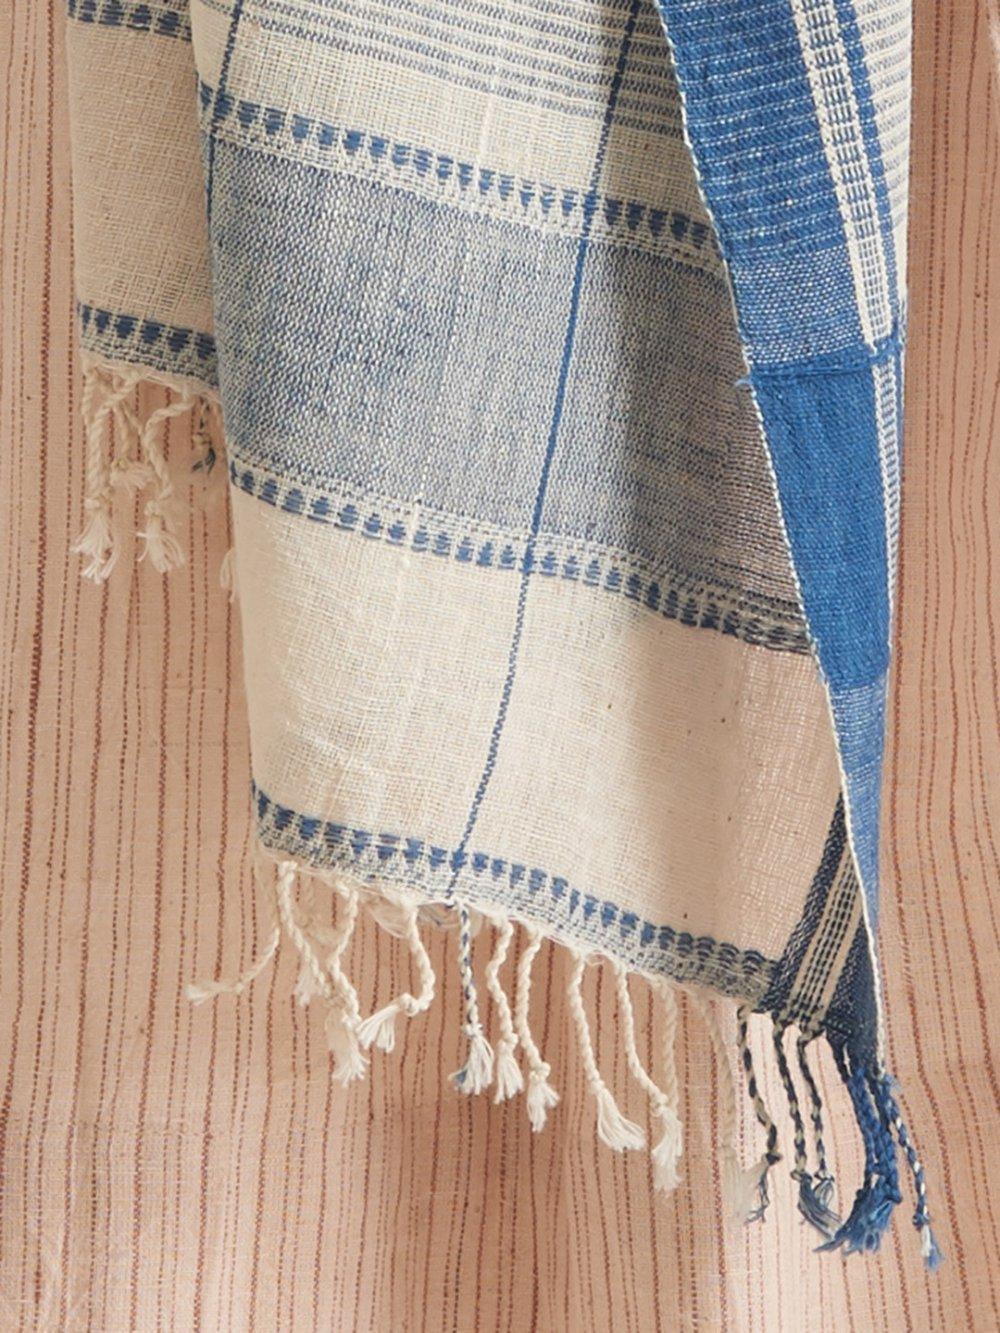 patrah.com Organic Clothing